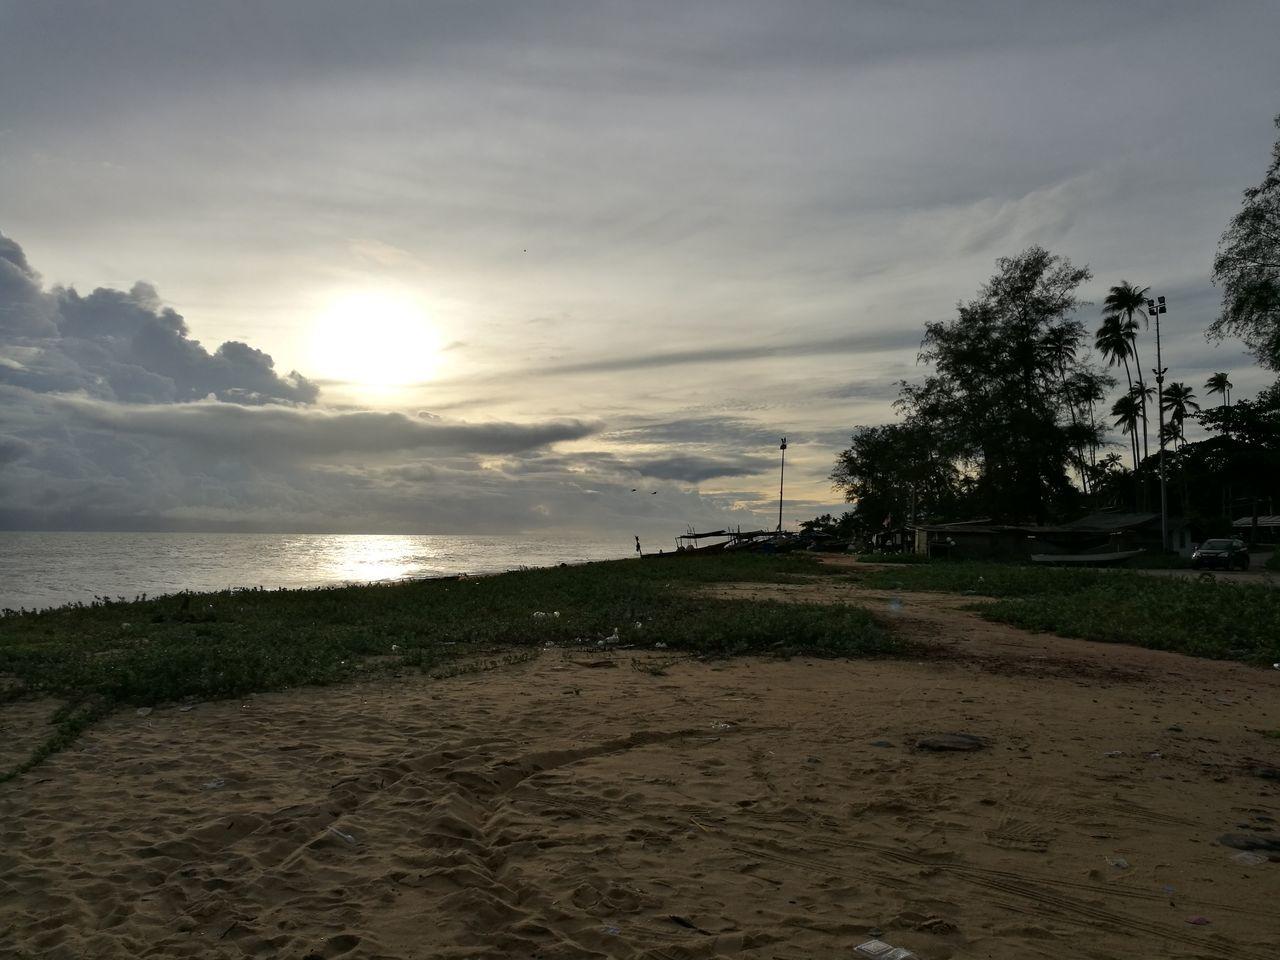 Beach Sand Sea Sky Nature Cloud - Sky Outdoors Water No People Beauty In Nature Baturakit Terengganukite Terengganu